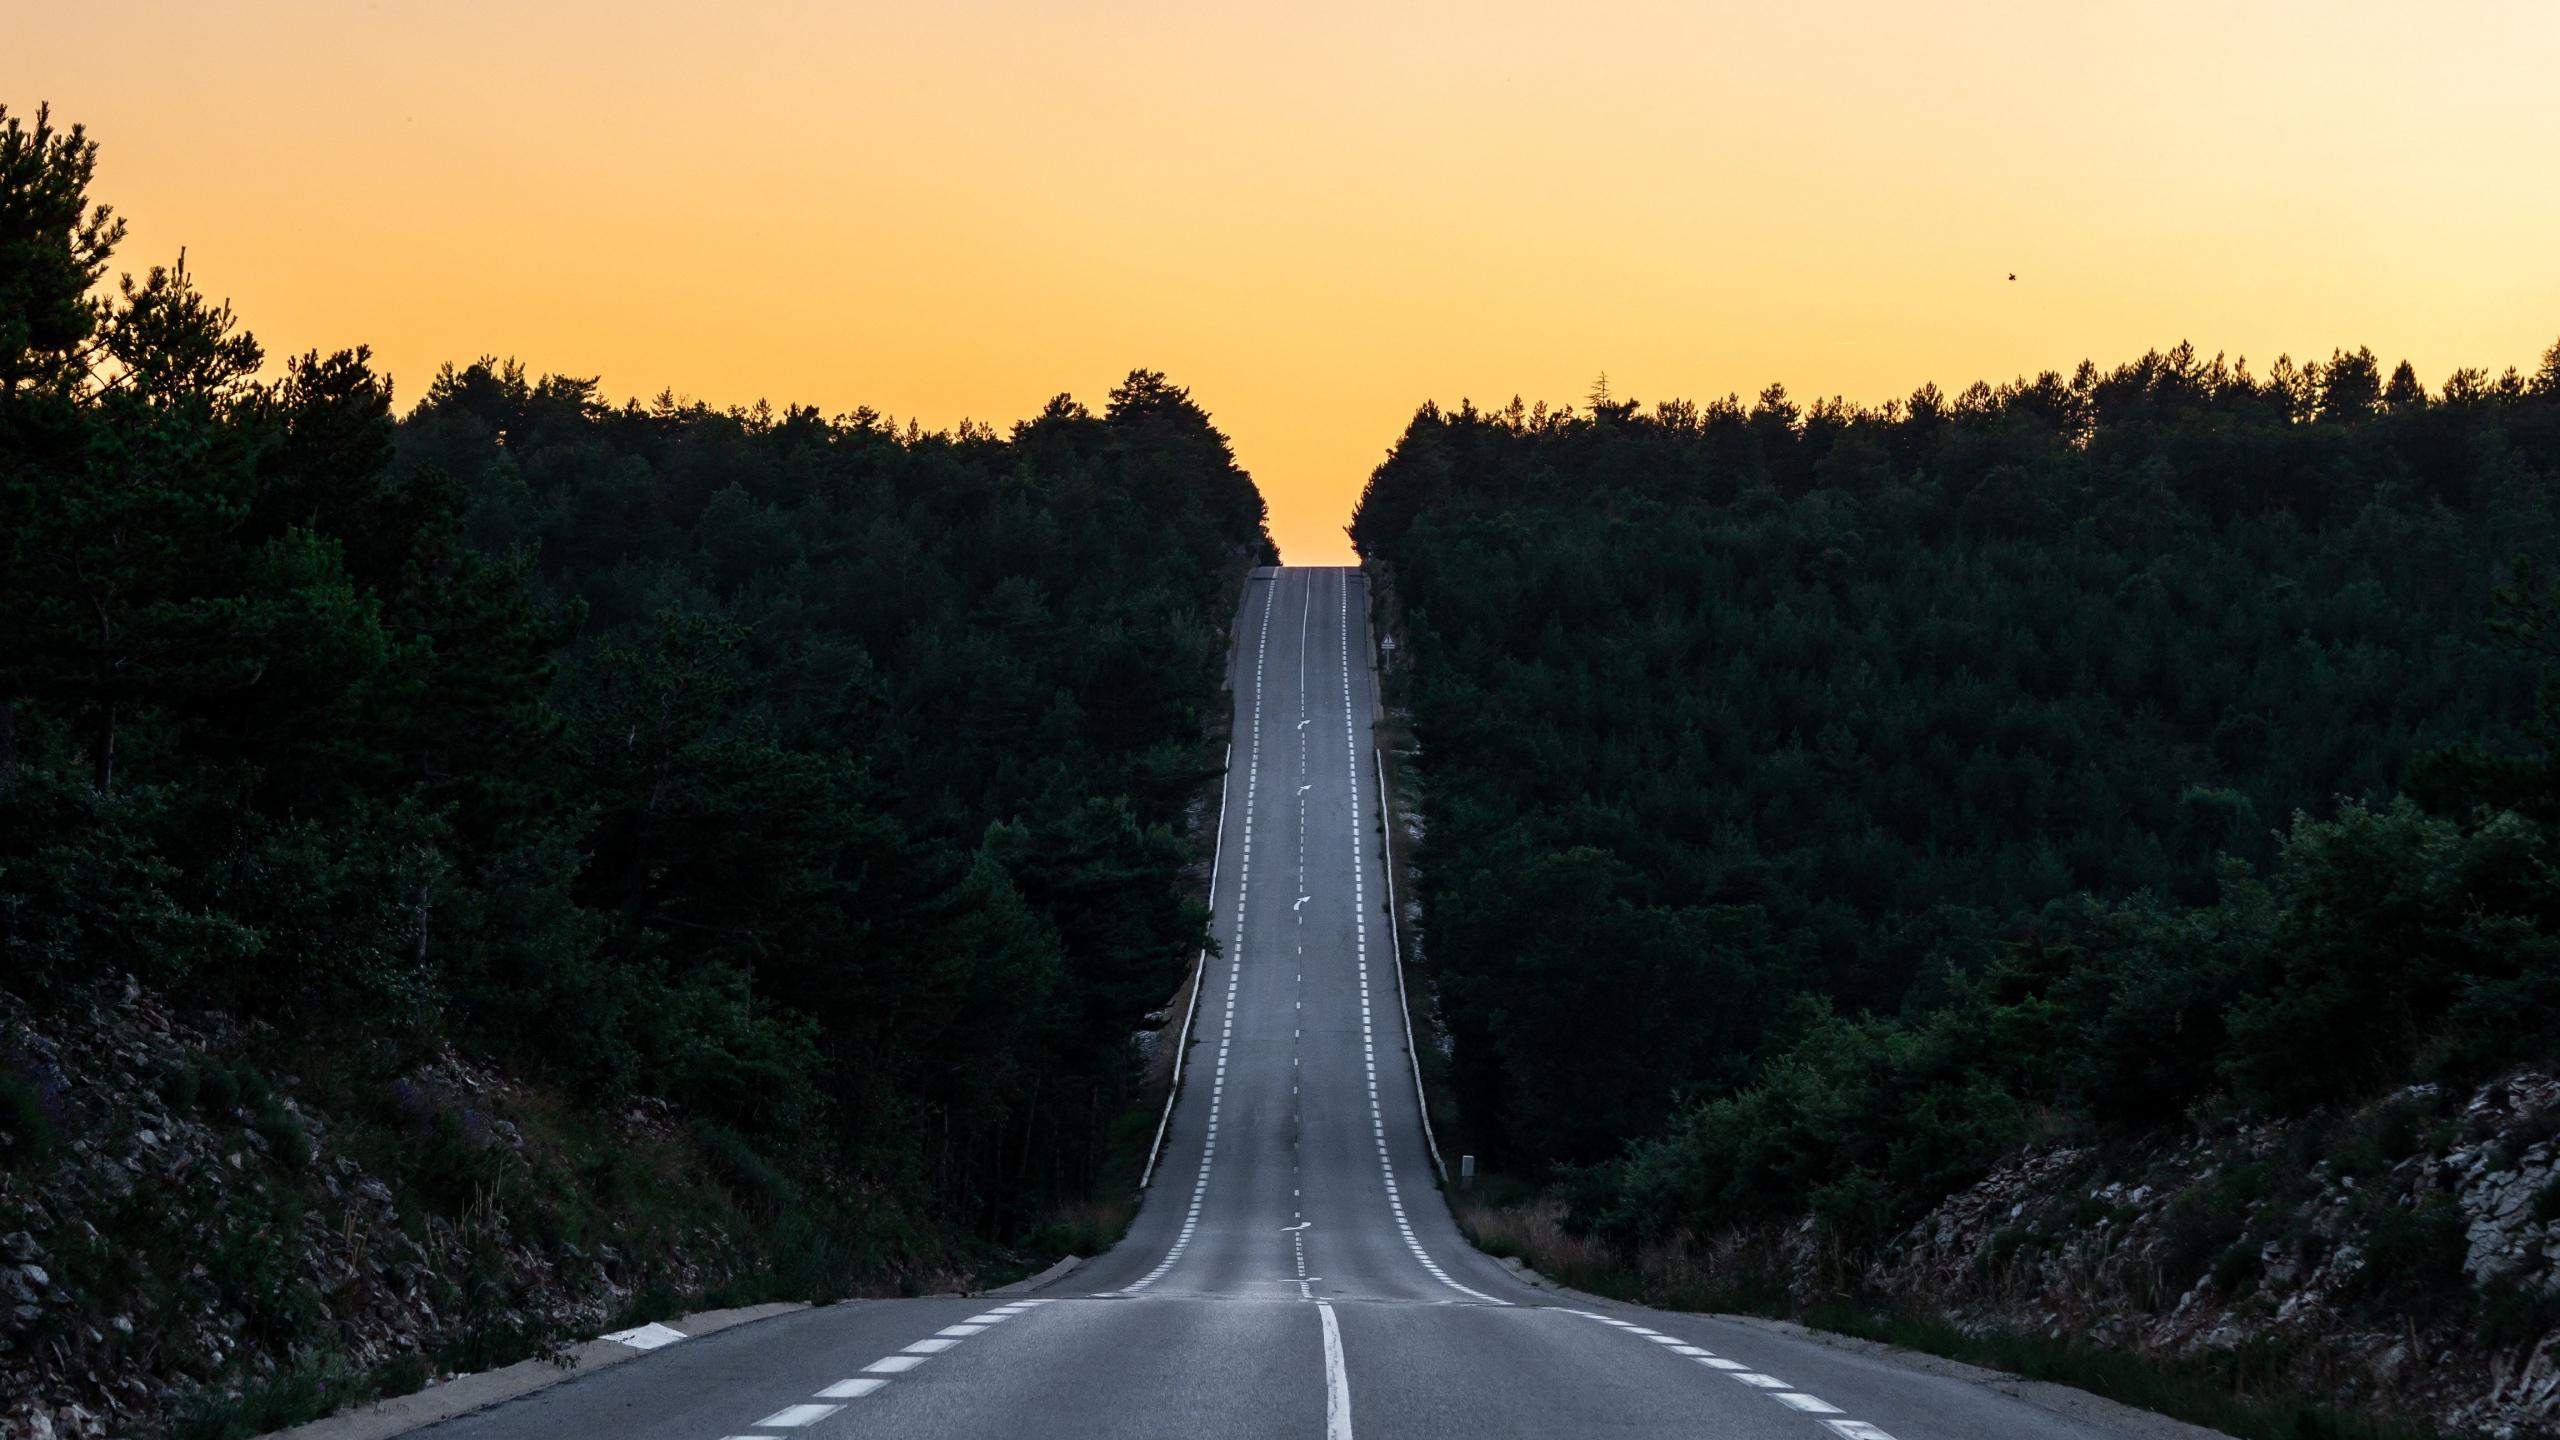 2560x1440 wallpaper road: Download 2560x1440 Wallpaper Road, Journey, Sunset, France